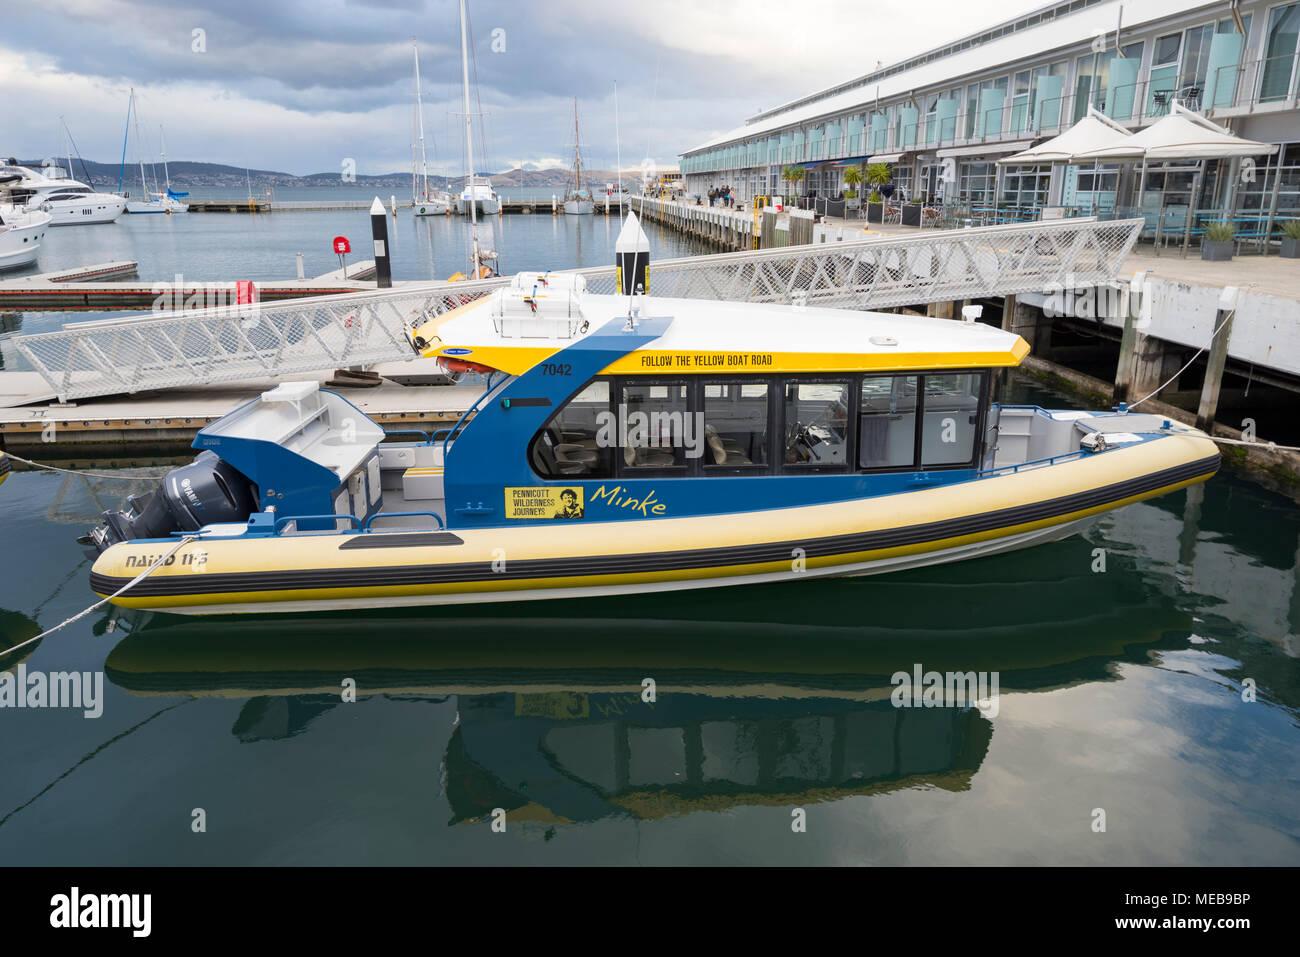 Pennicott WiIderness Journeys boat Minke docked at Hobart - Stock Image